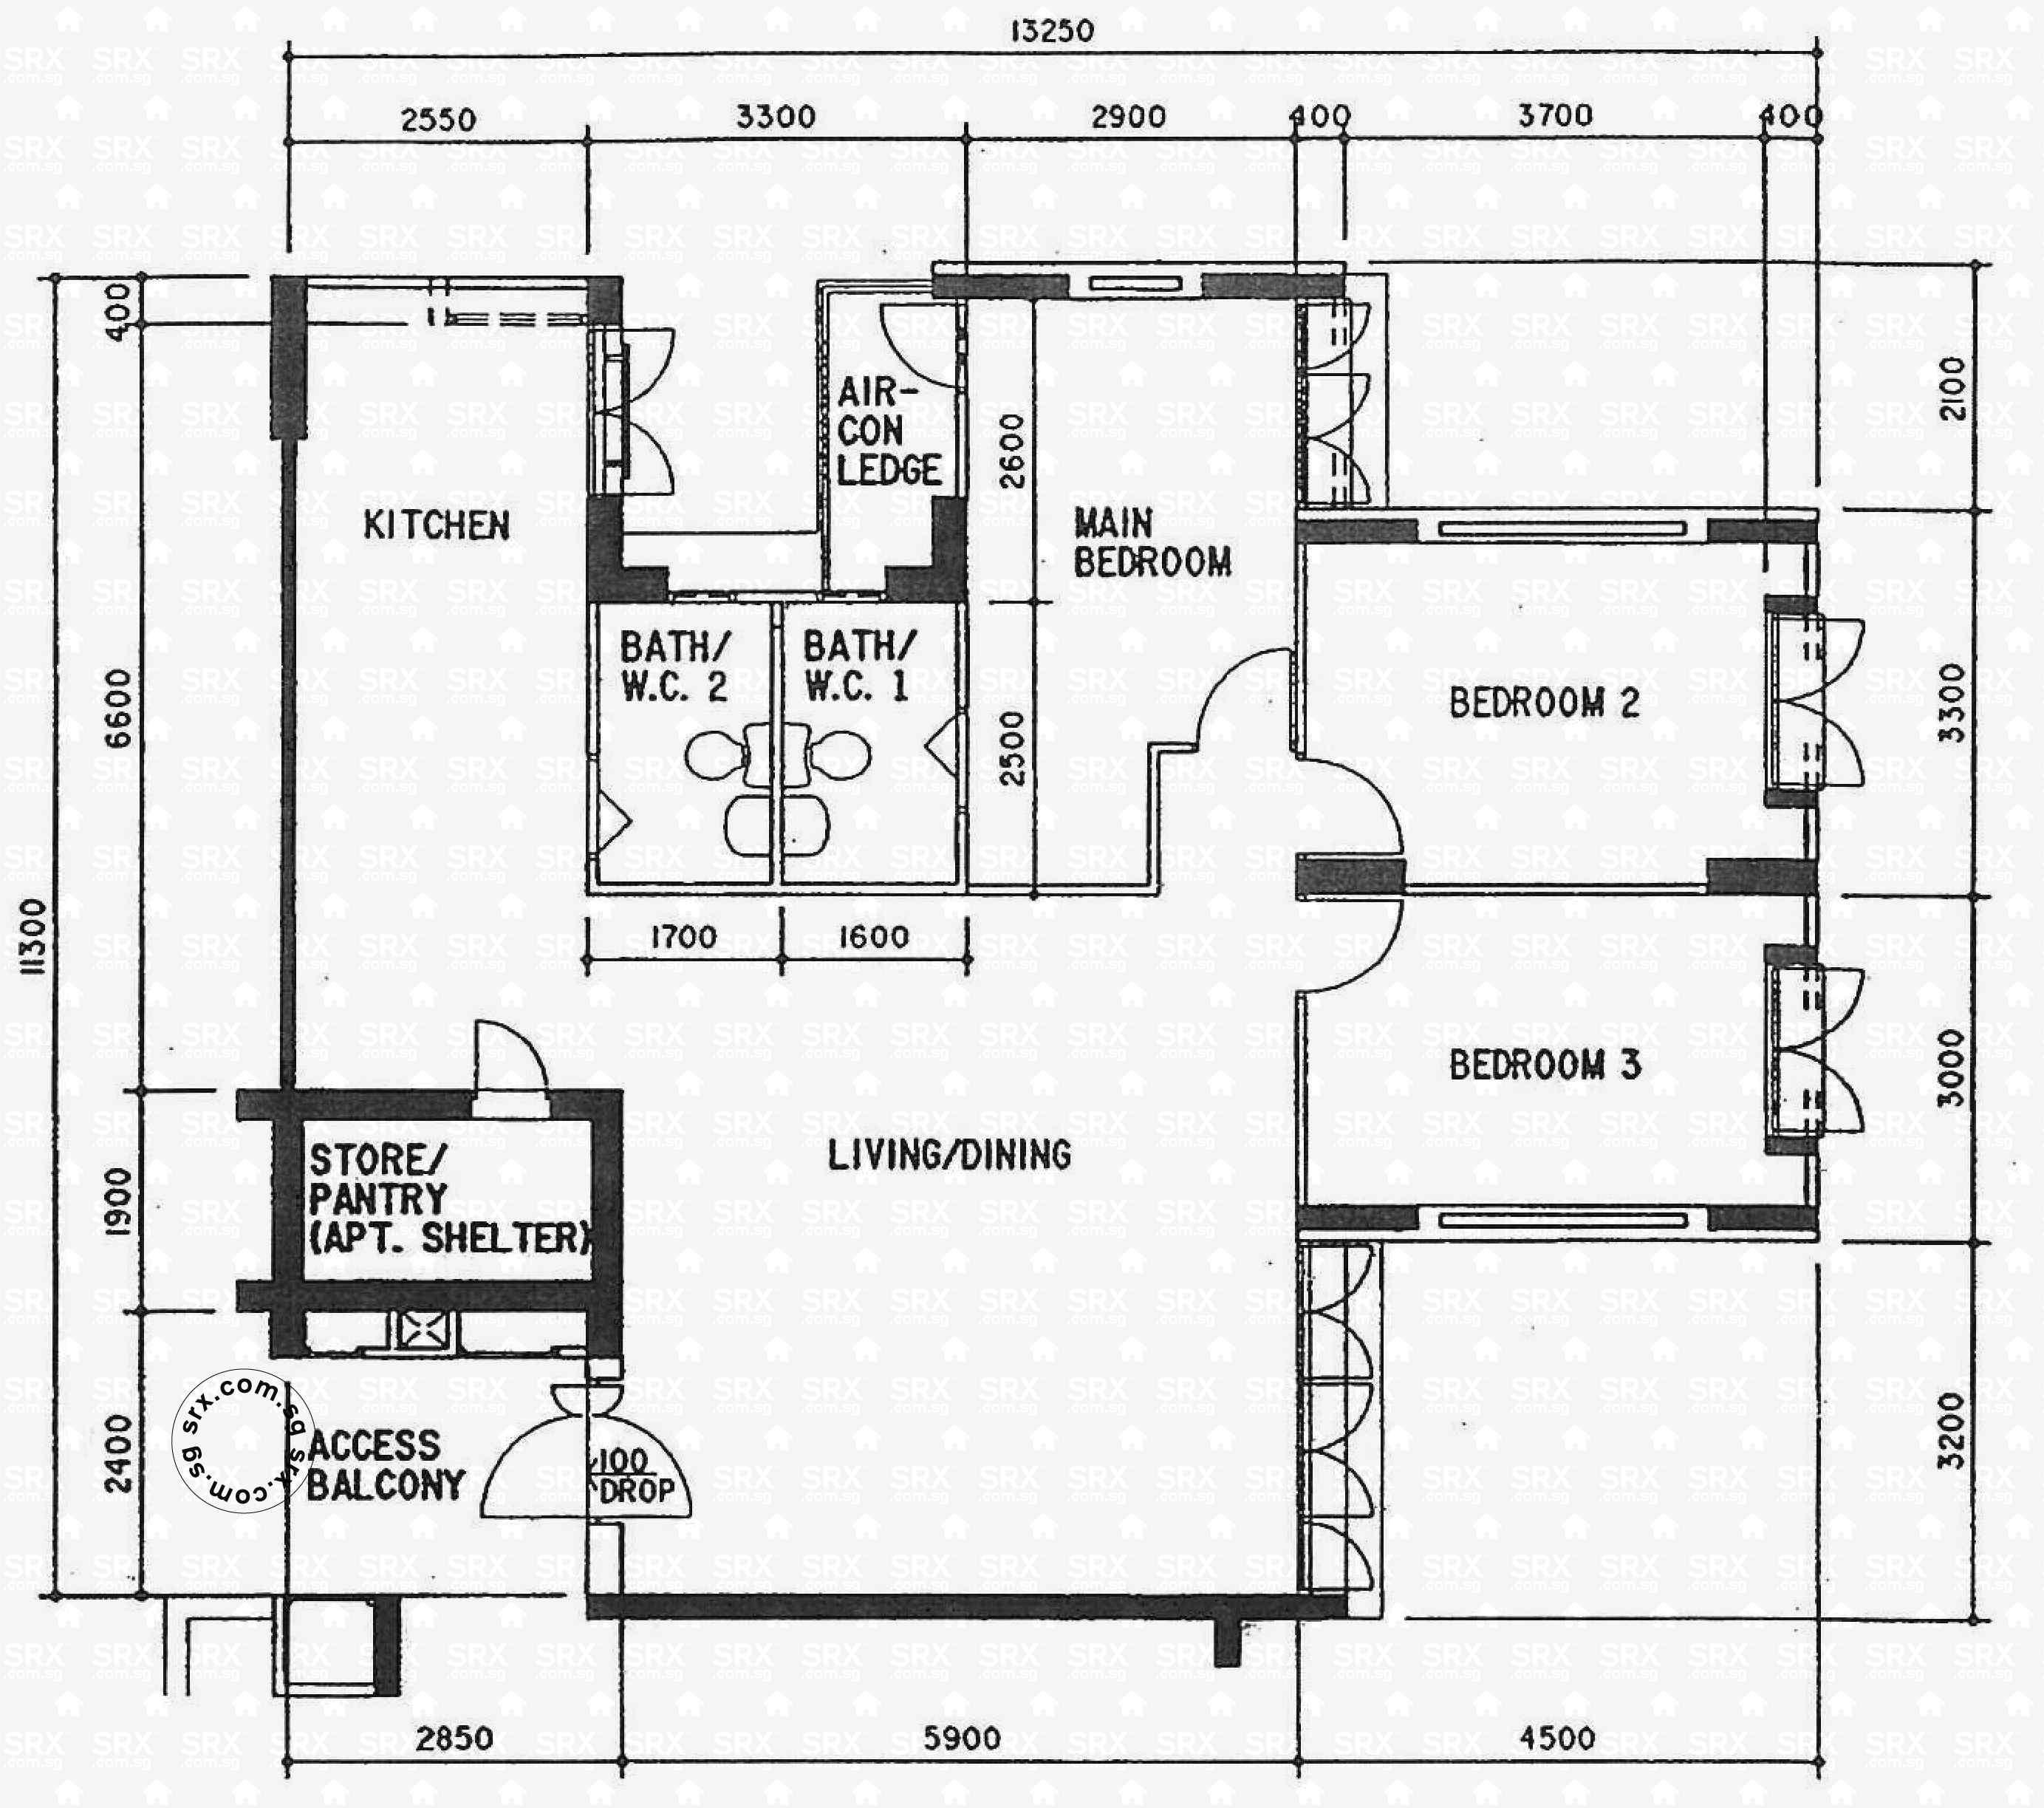 Floor Plans For 667D Jurong West Street 65 S644667 HDB Details